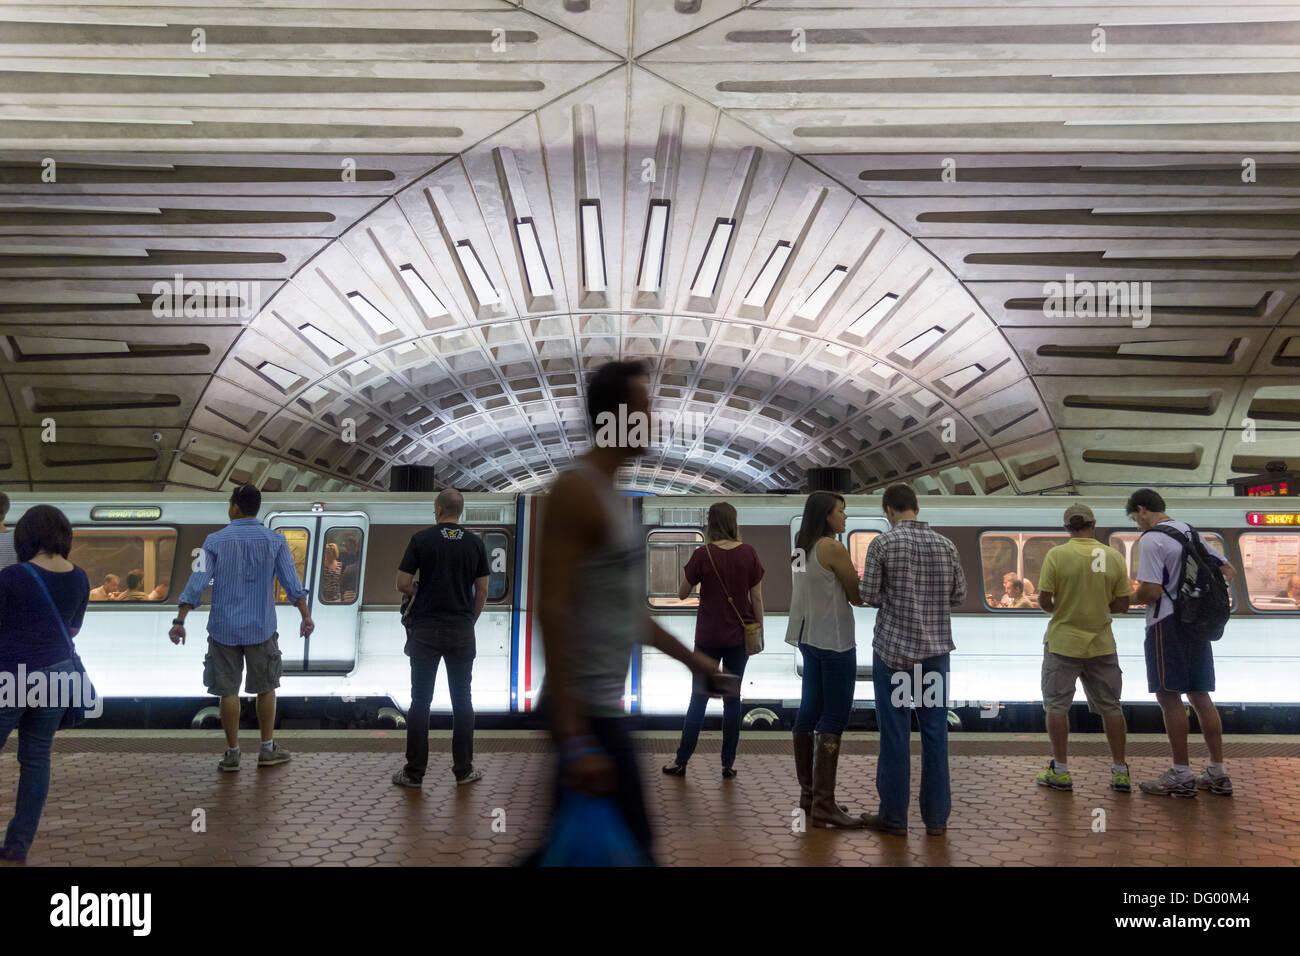 Metro Center subway station, Washington DC. People, tourists, waiting on the platform for the underground train to arrive. - Stock Image